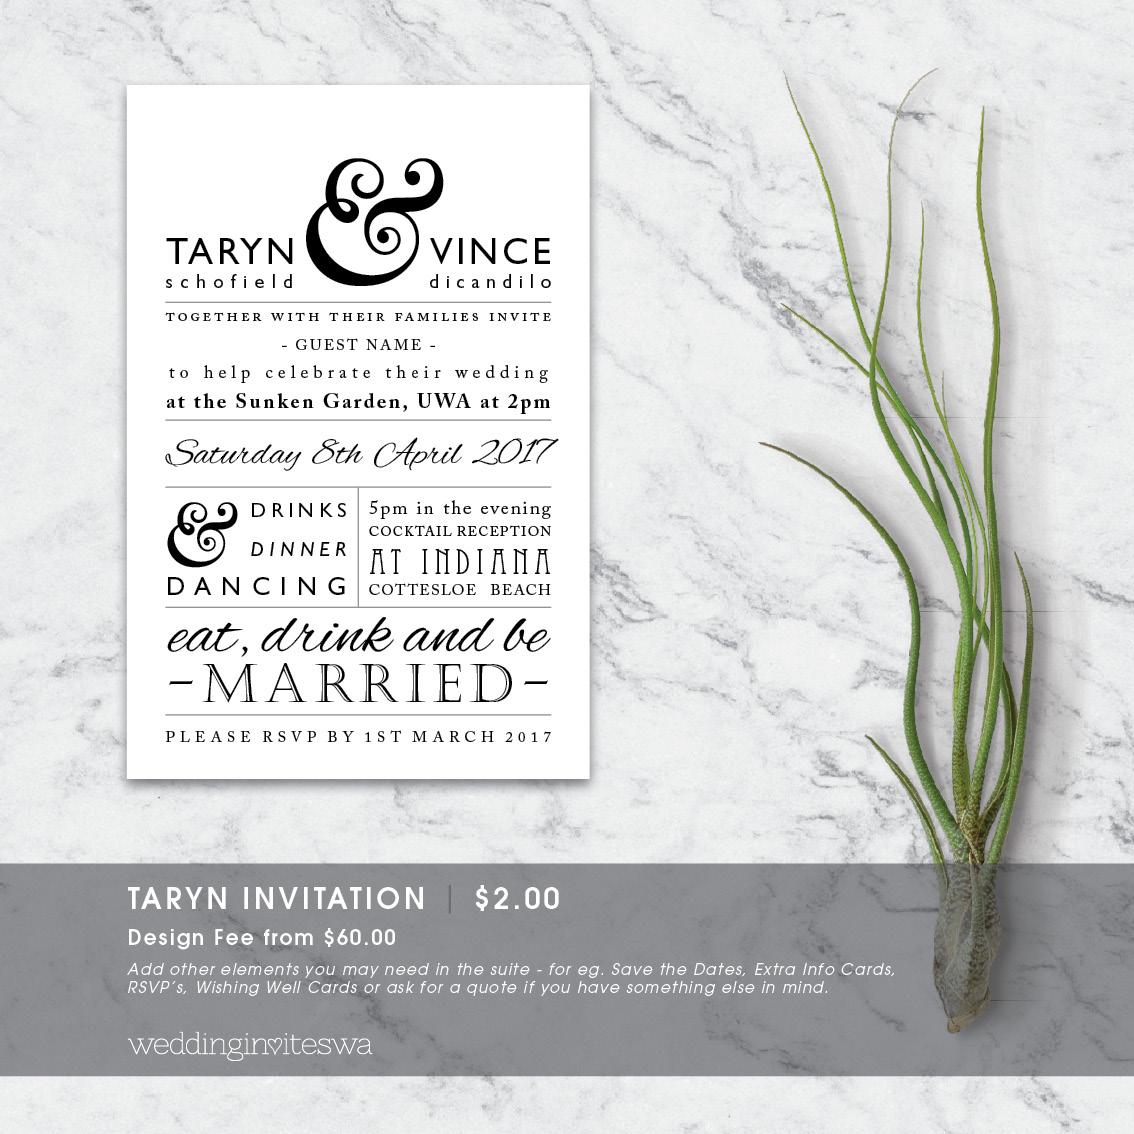 TARYN_invite